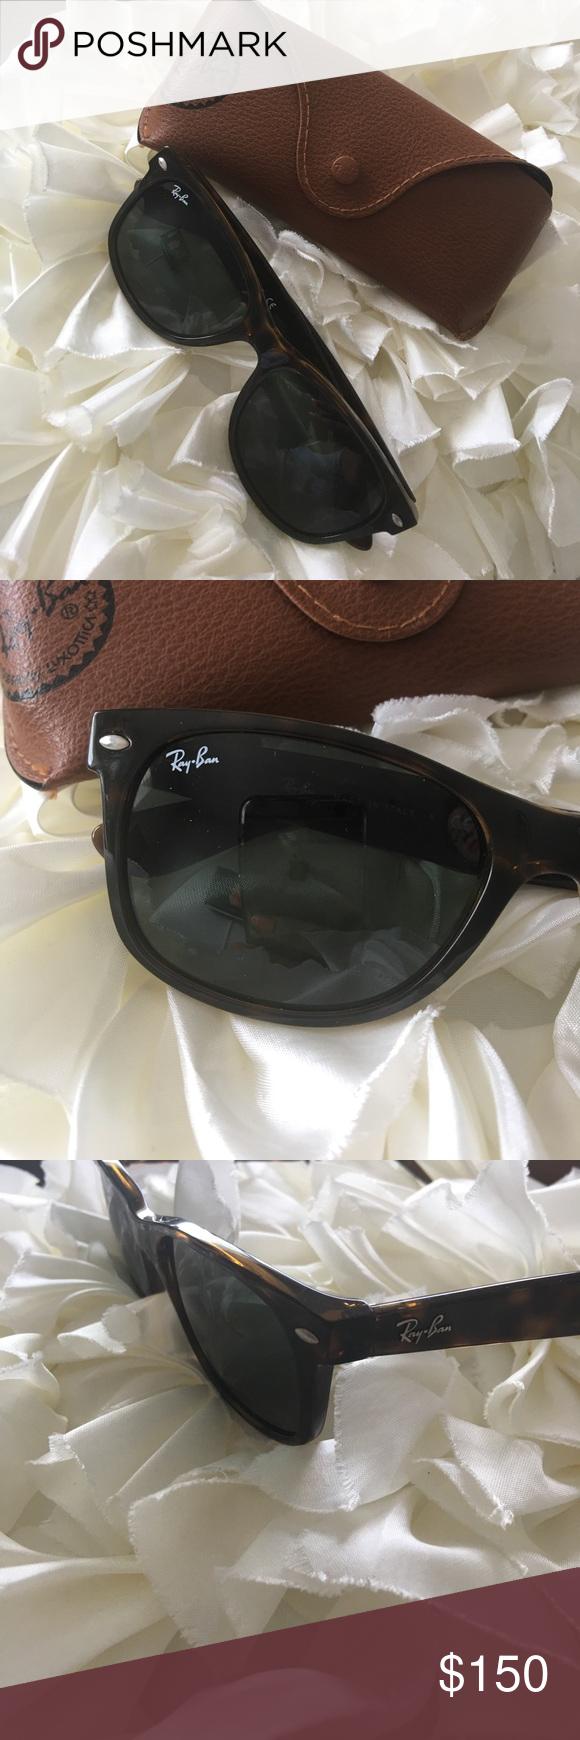 5a7bea7acb Ray Ban New Wayfarer Sunglasses NWOT Ray Ban Sunglasses